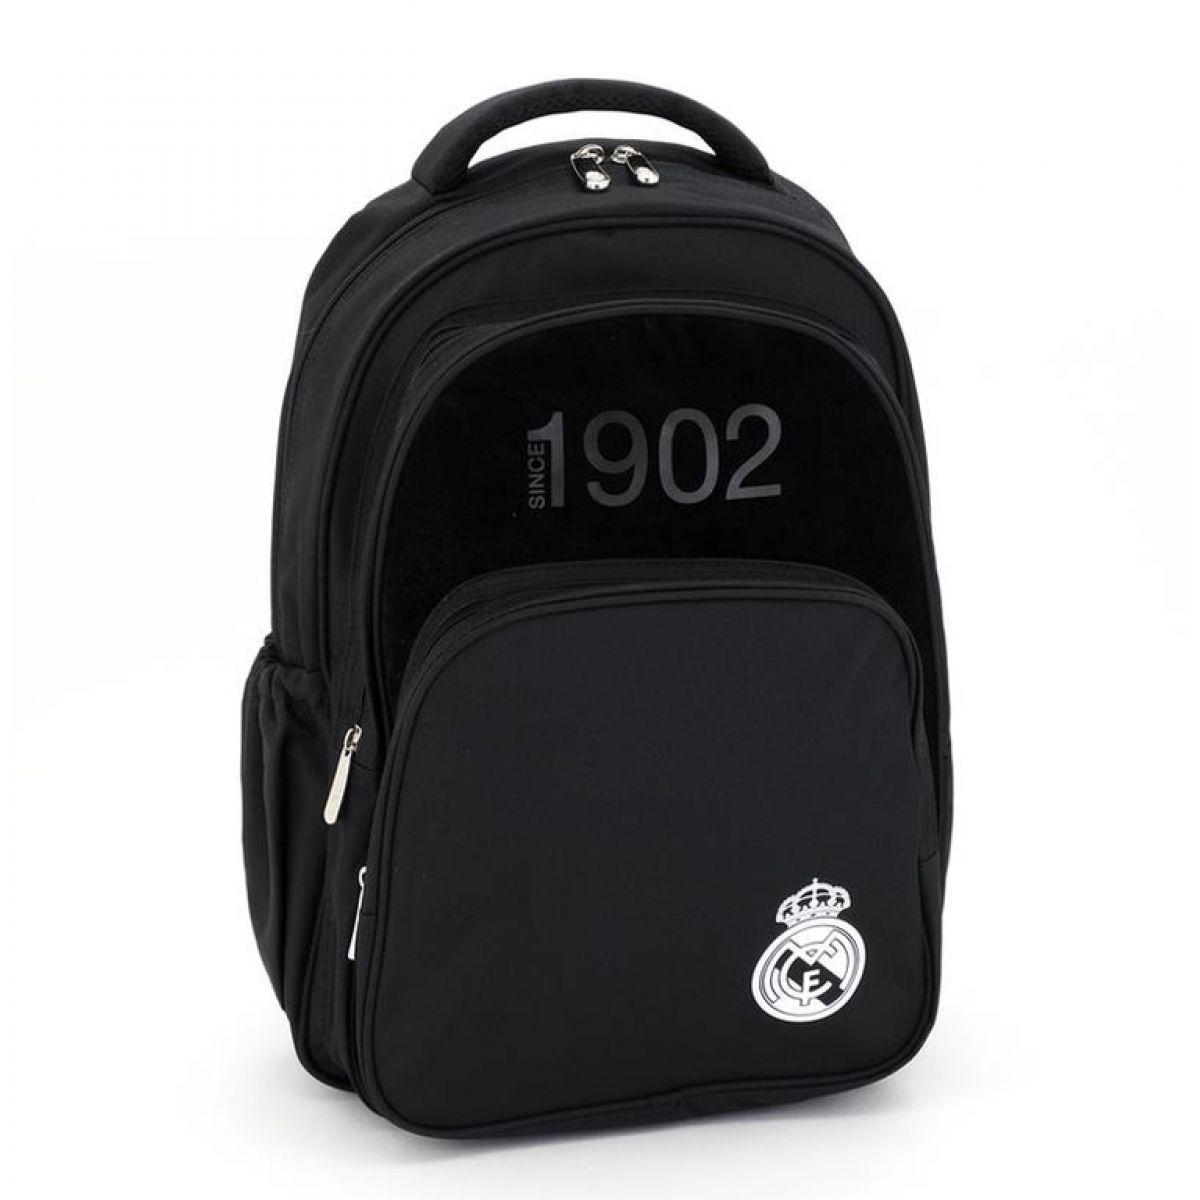 Ars Una Školní batoh Real Madrid black 3k